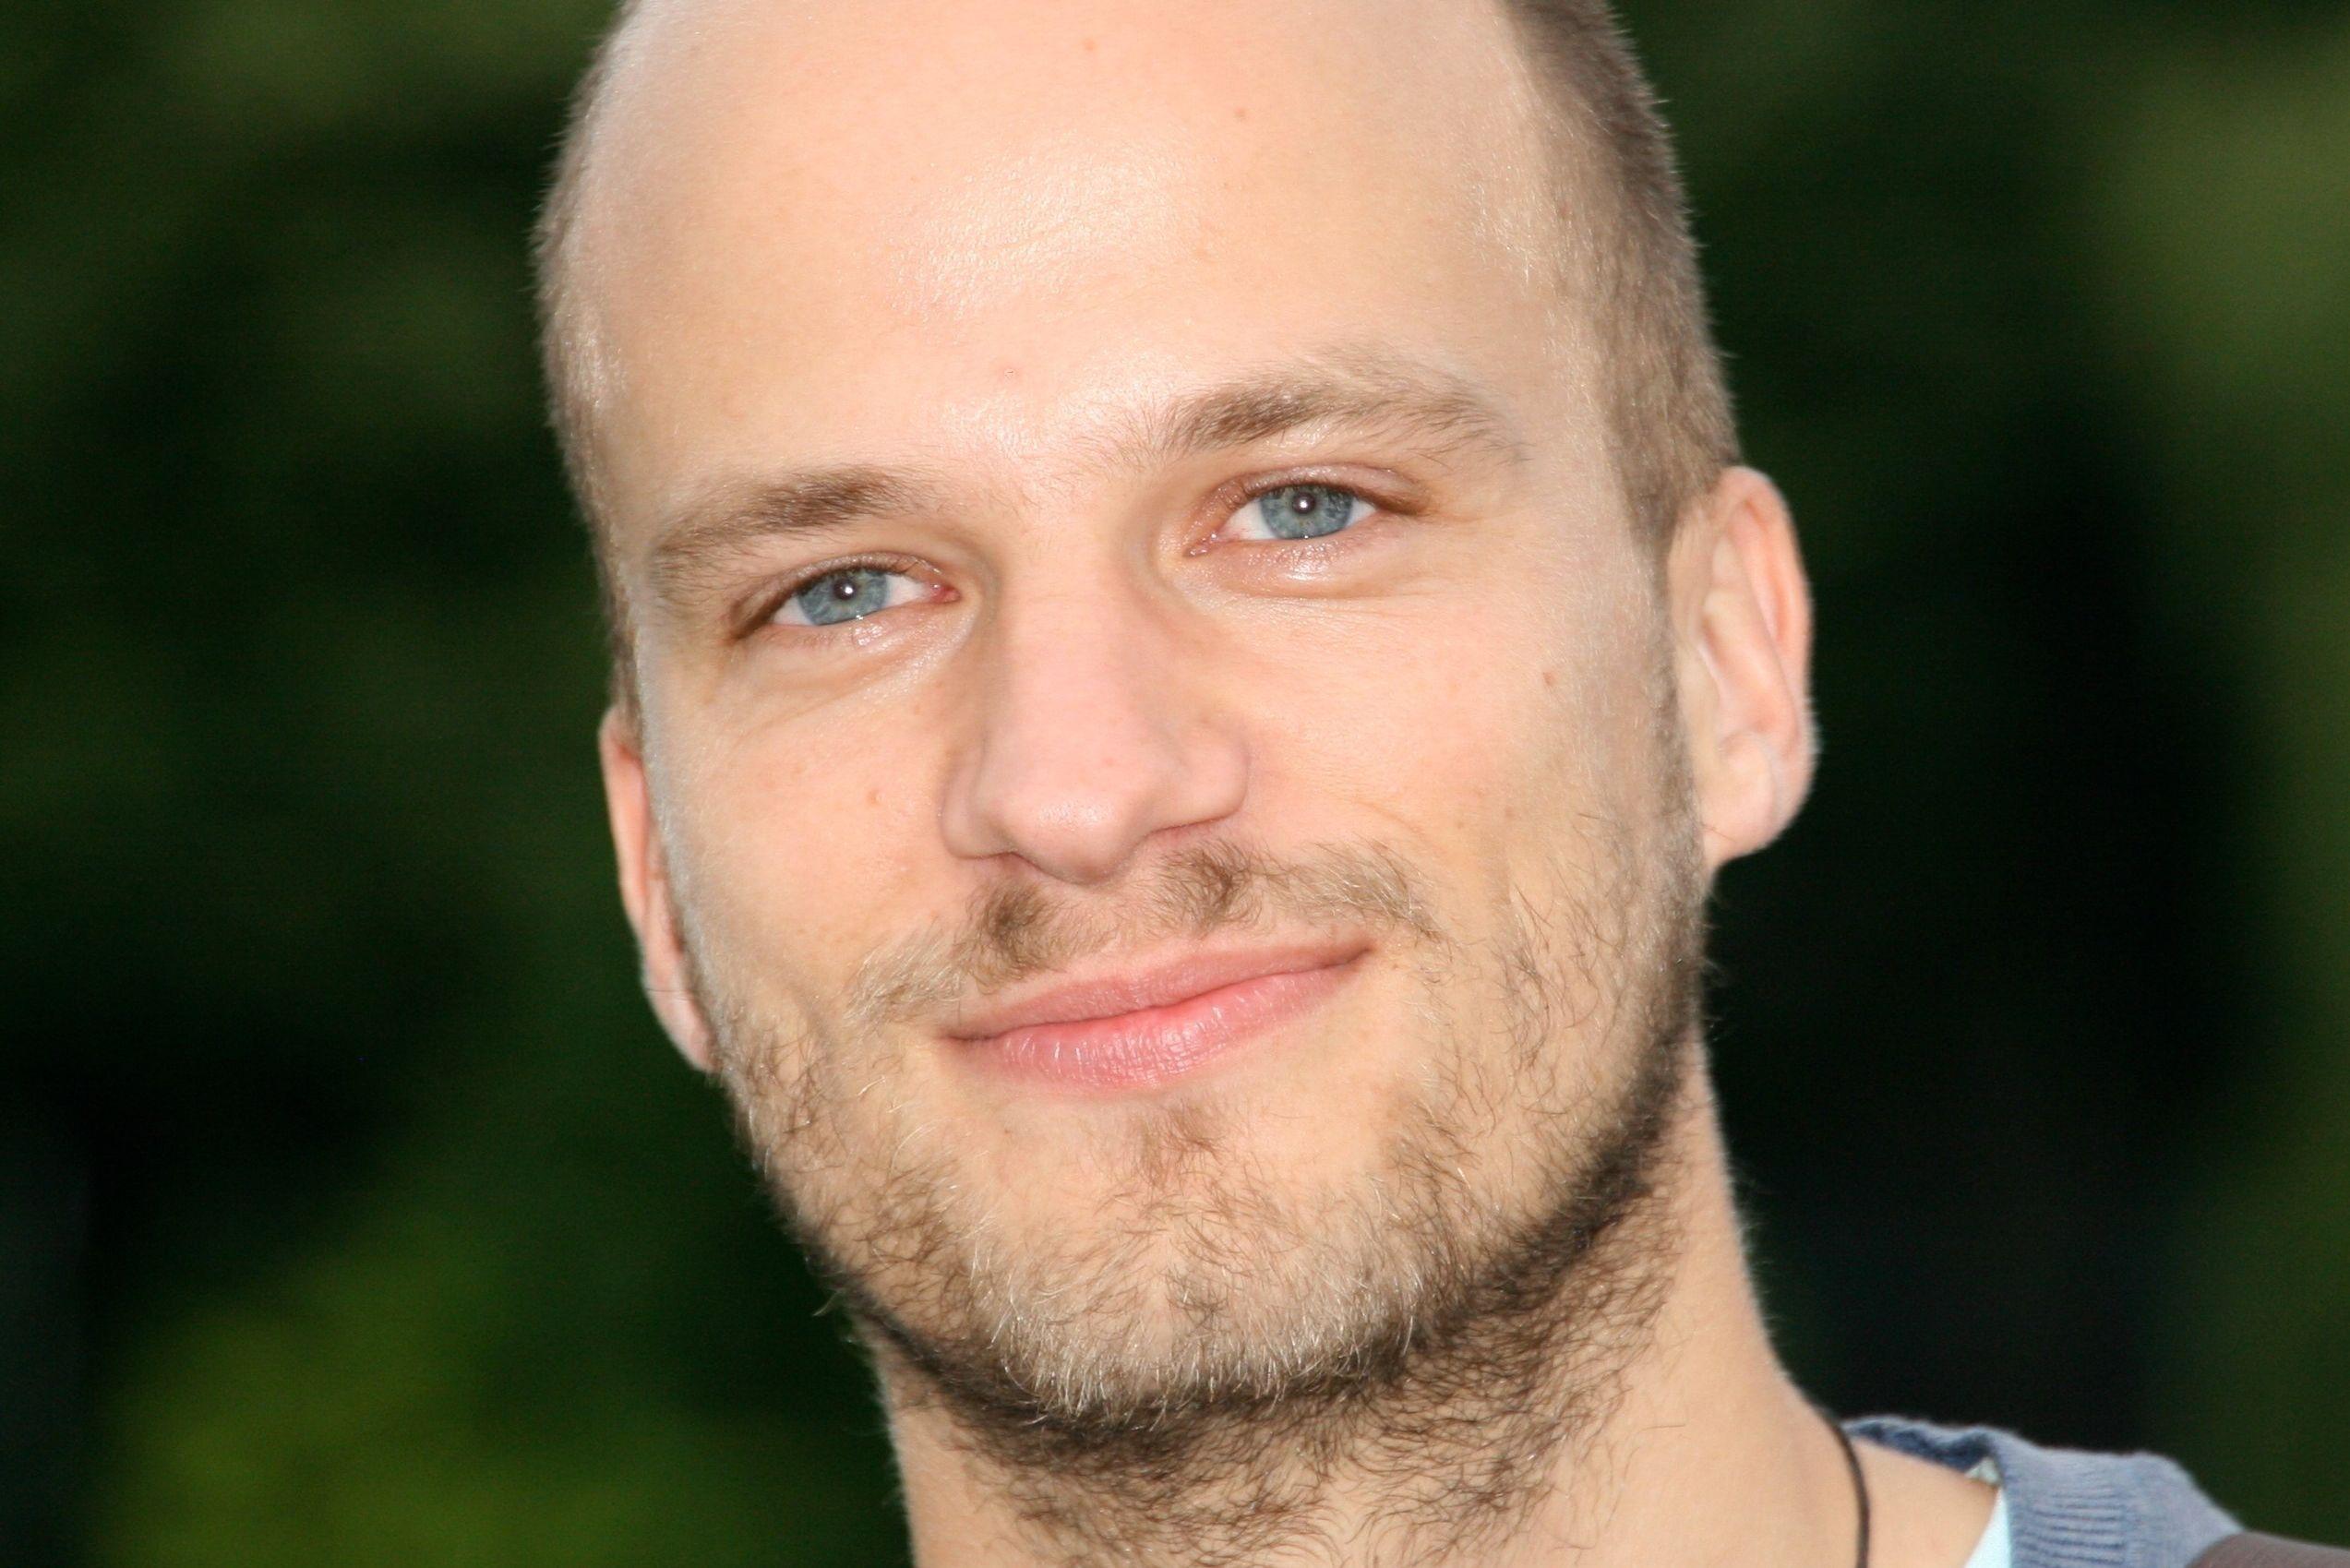 Jannik Strötgen